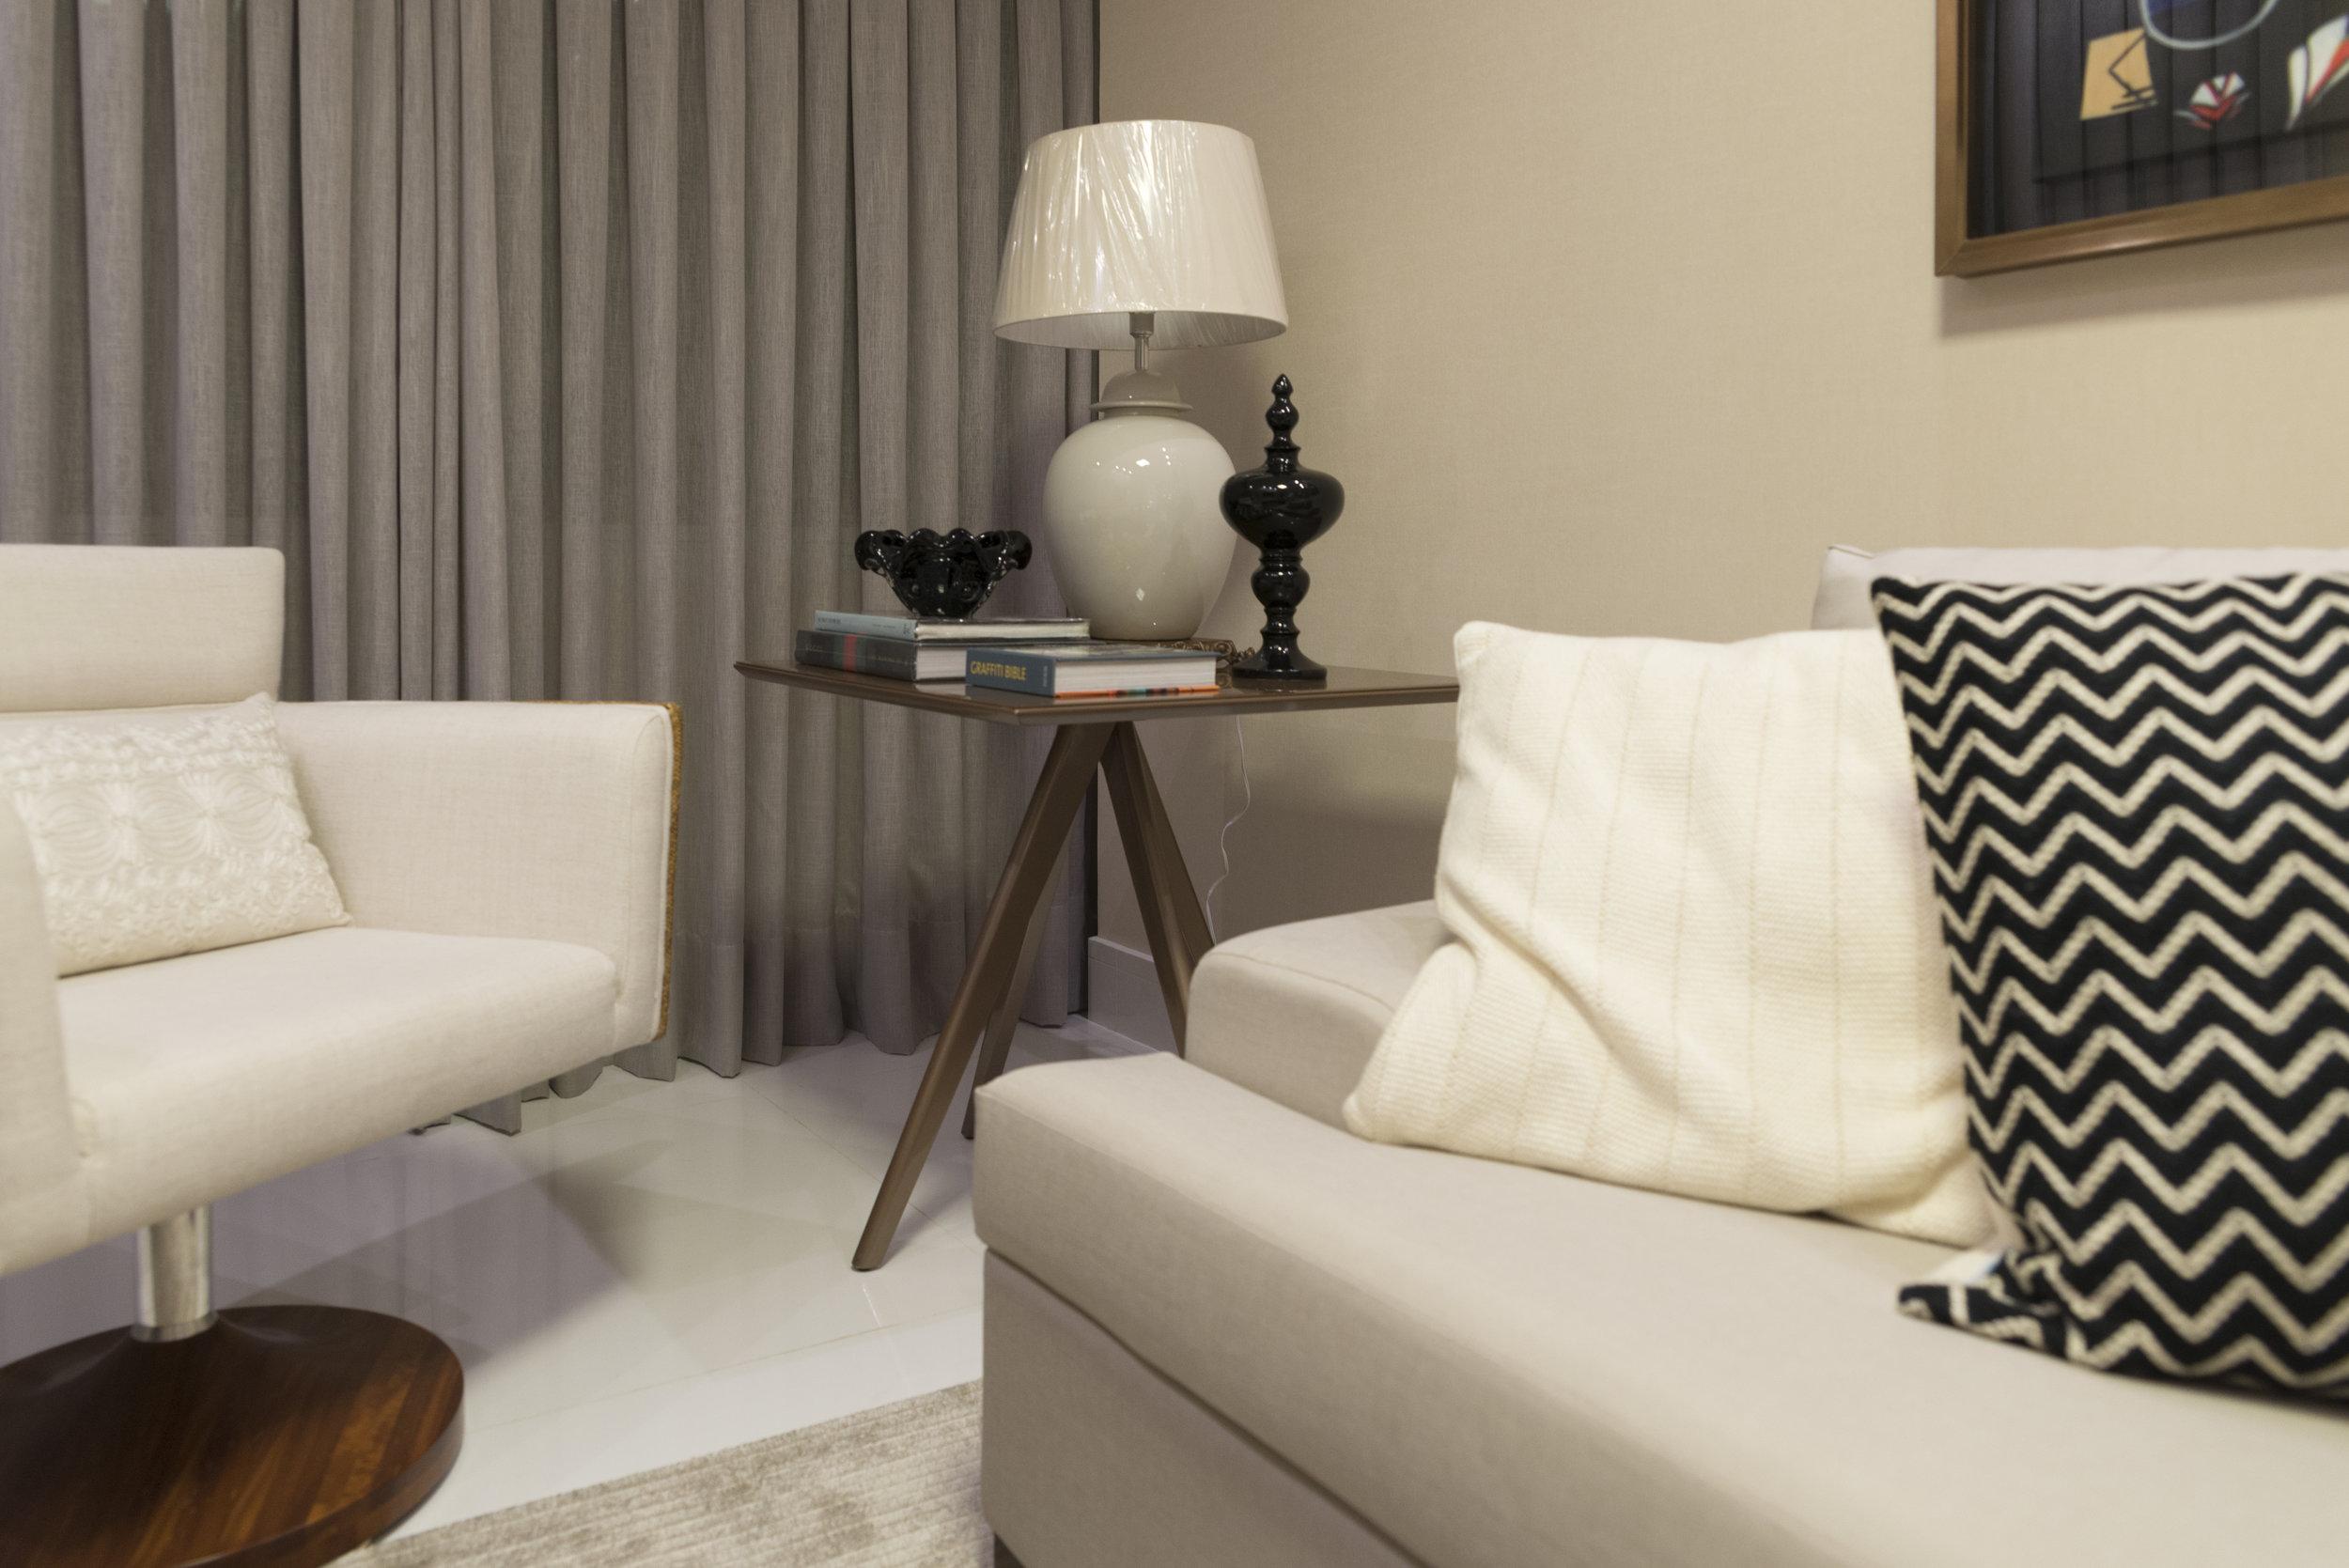 projeto-arquitetonico-robertoindira-duo-arquitetura-apartamentos-estar-014.jpg